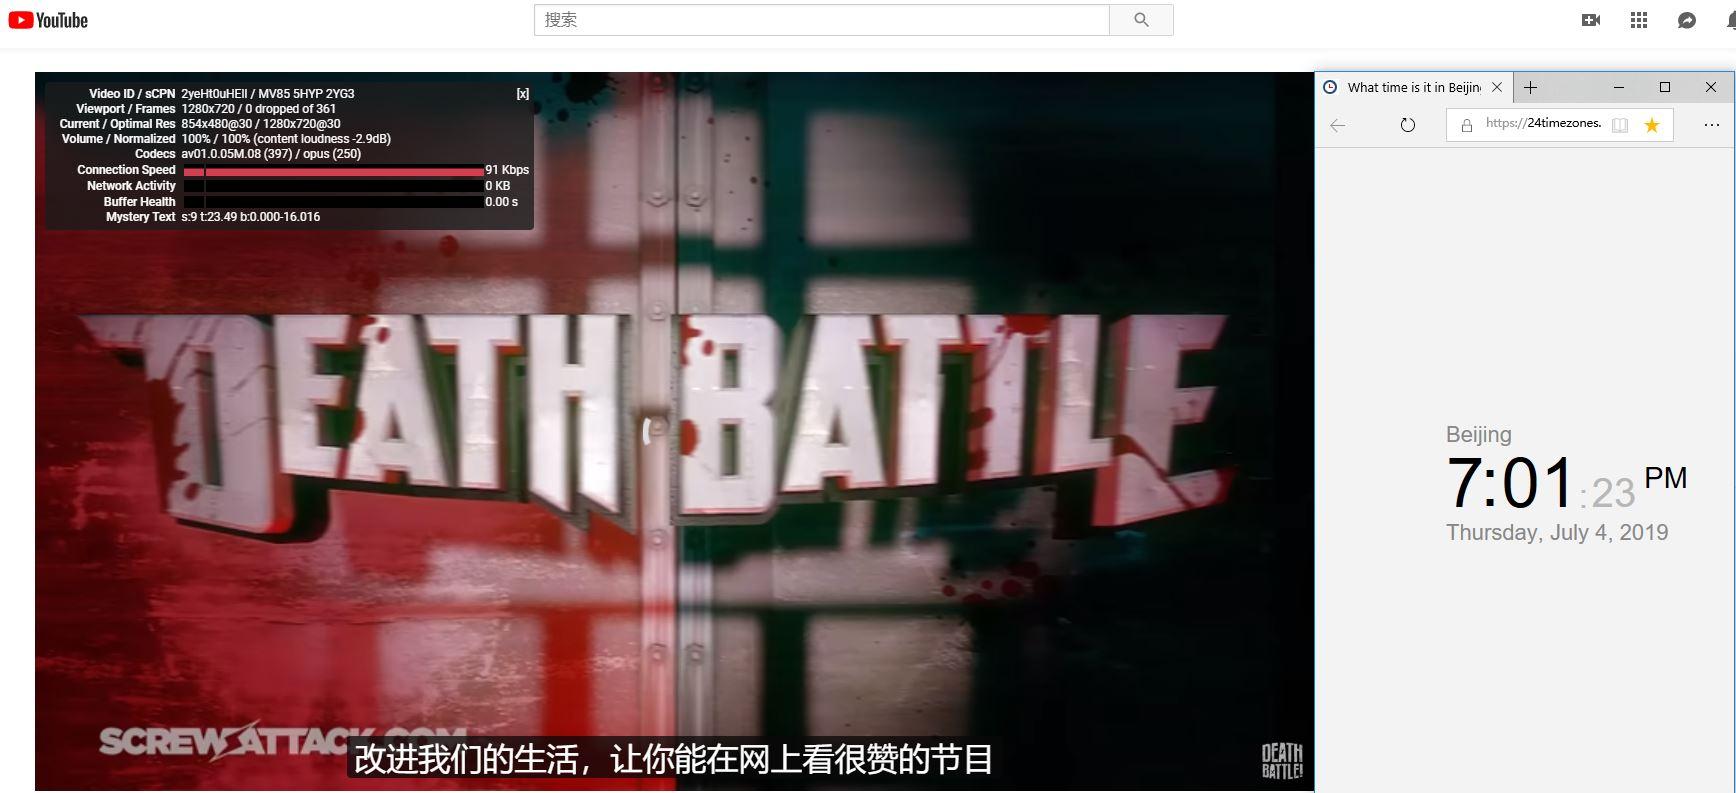 windows nordvpn 法国 81节点 中国VPN 翻墙 科学上网 YouTube测试-20190704